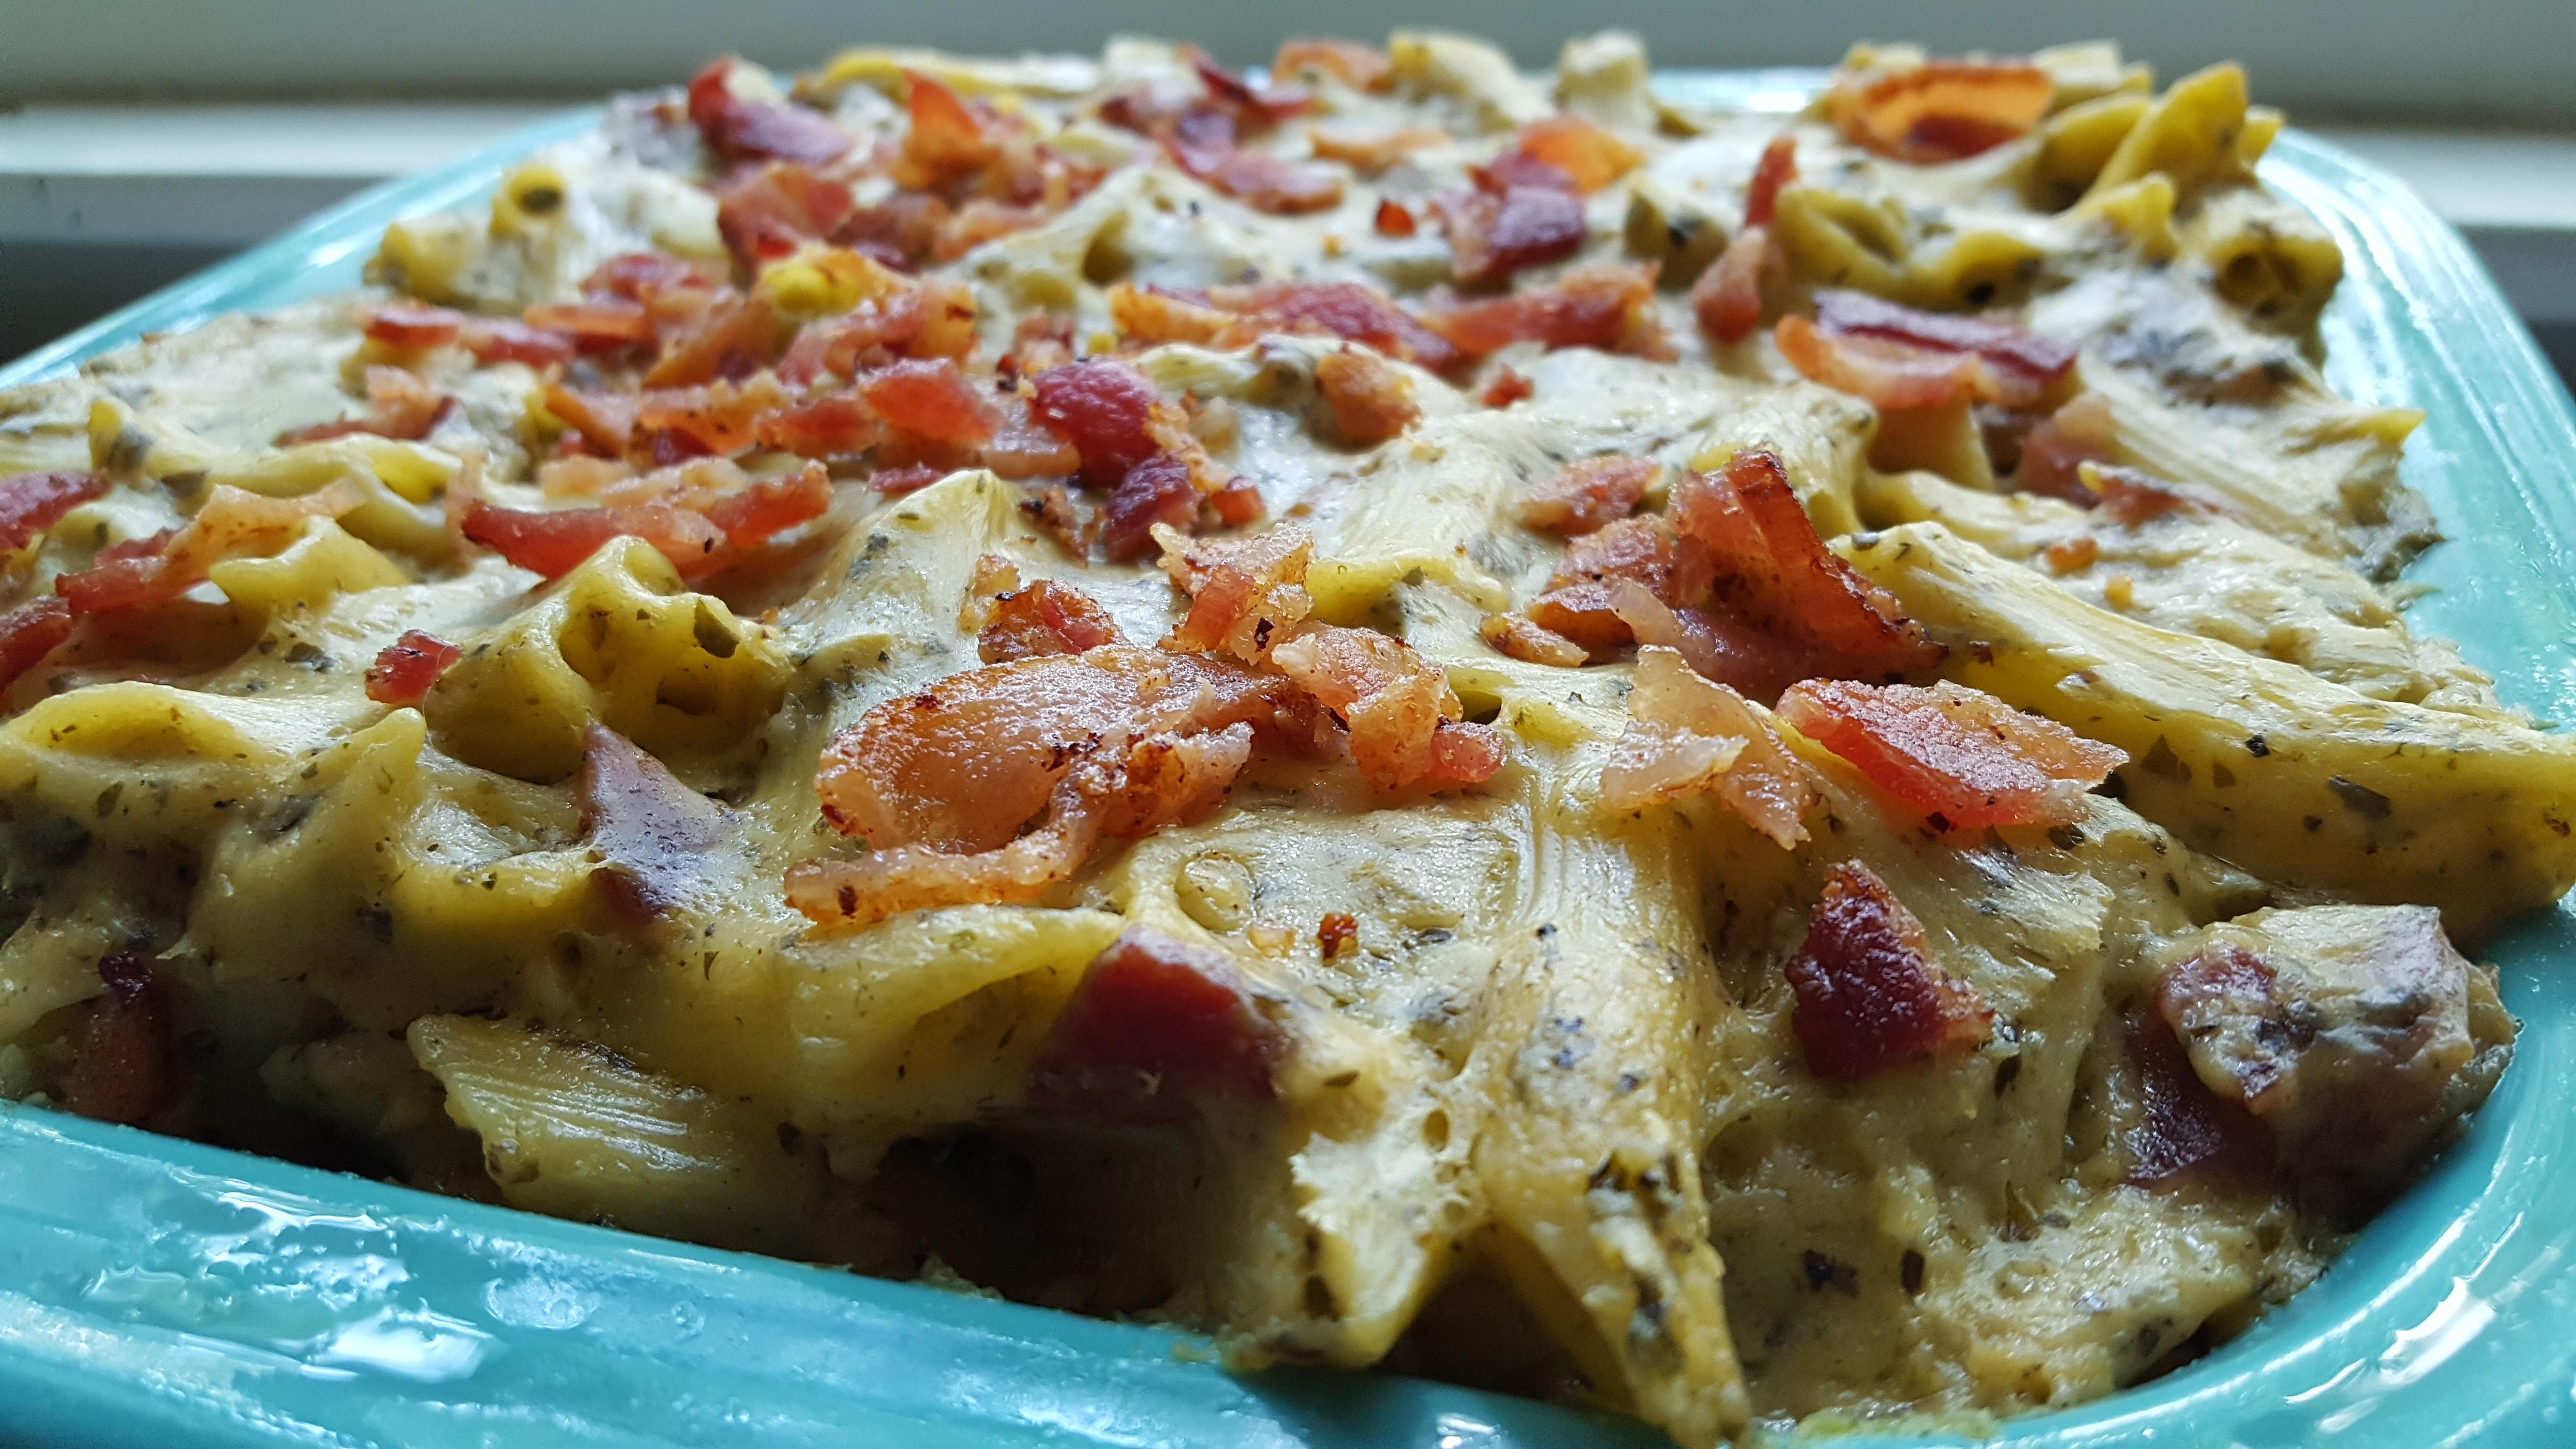 Bacon White Cheddar Pesto Mac and Cheese